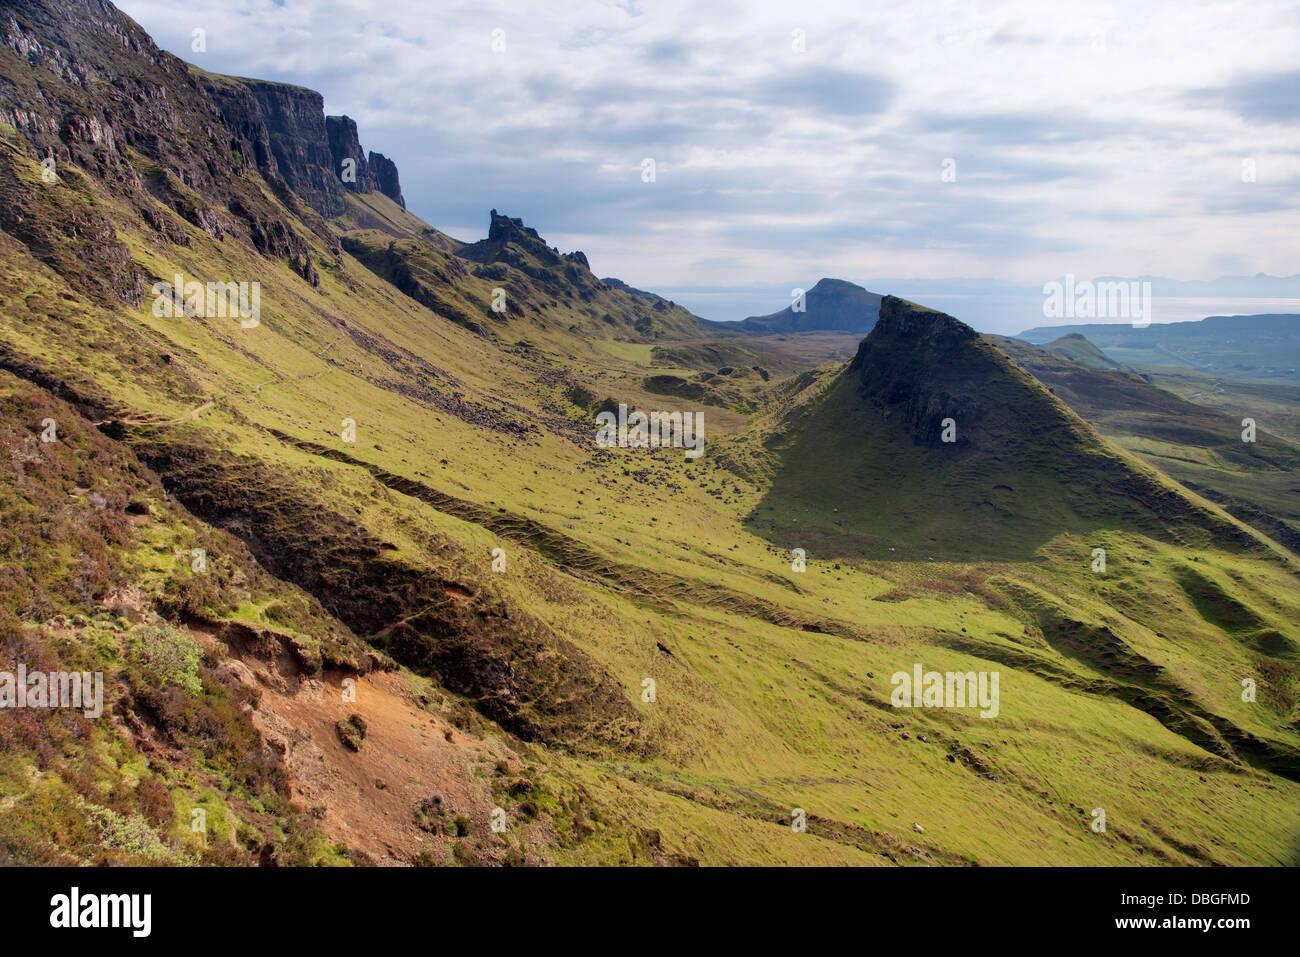 The Quiraing, Trotternish Peninsular Isle of Skye, Inner Hebrides Scotland, UK LA006379 - Stock Image